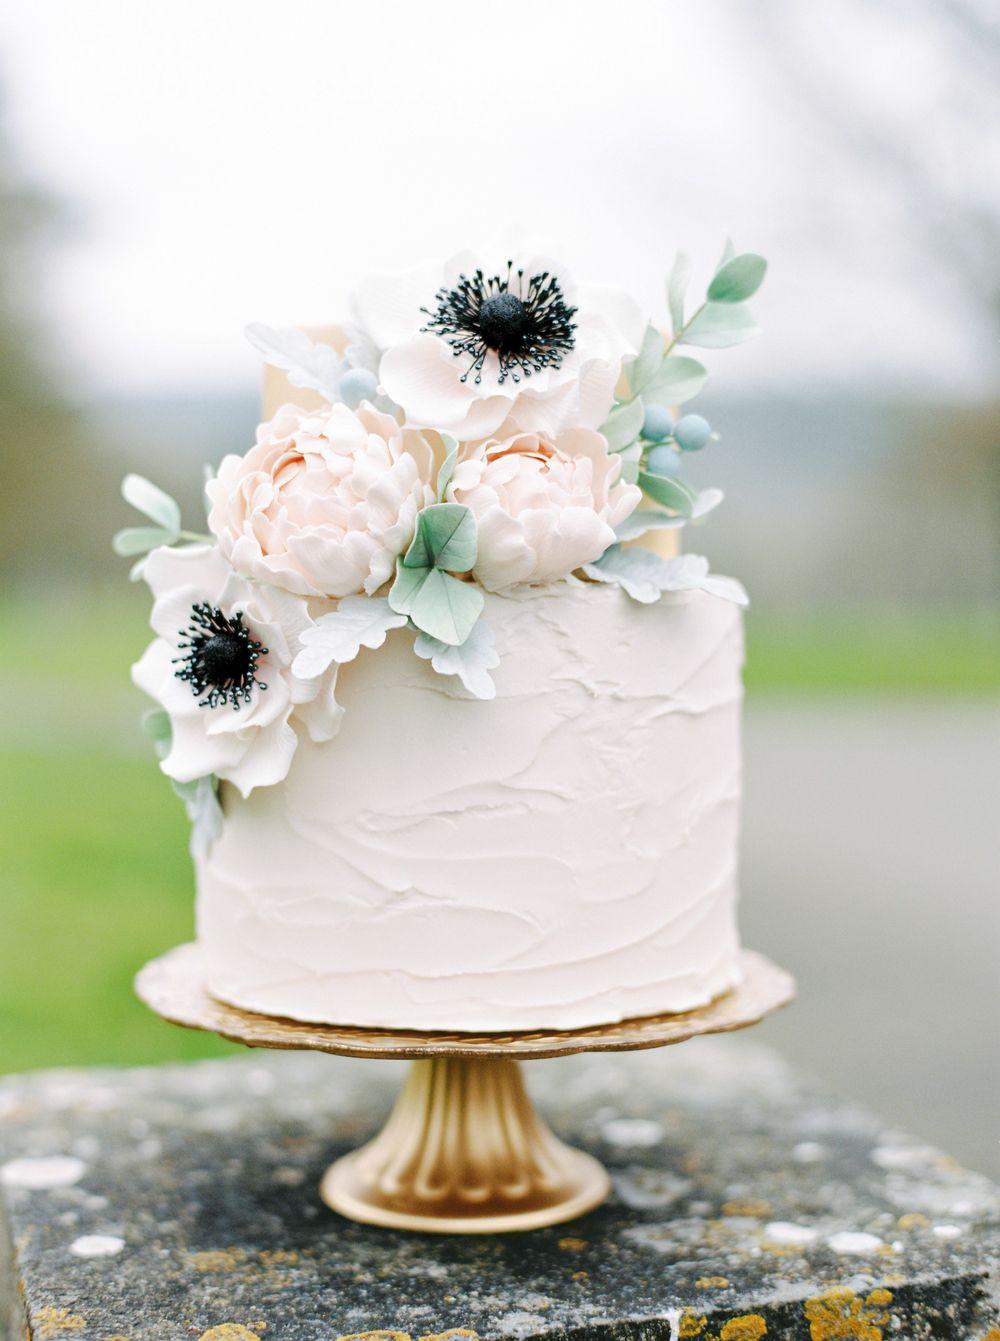 Pin by naz aktar on wedding pinterest cake wedding cake and wedding